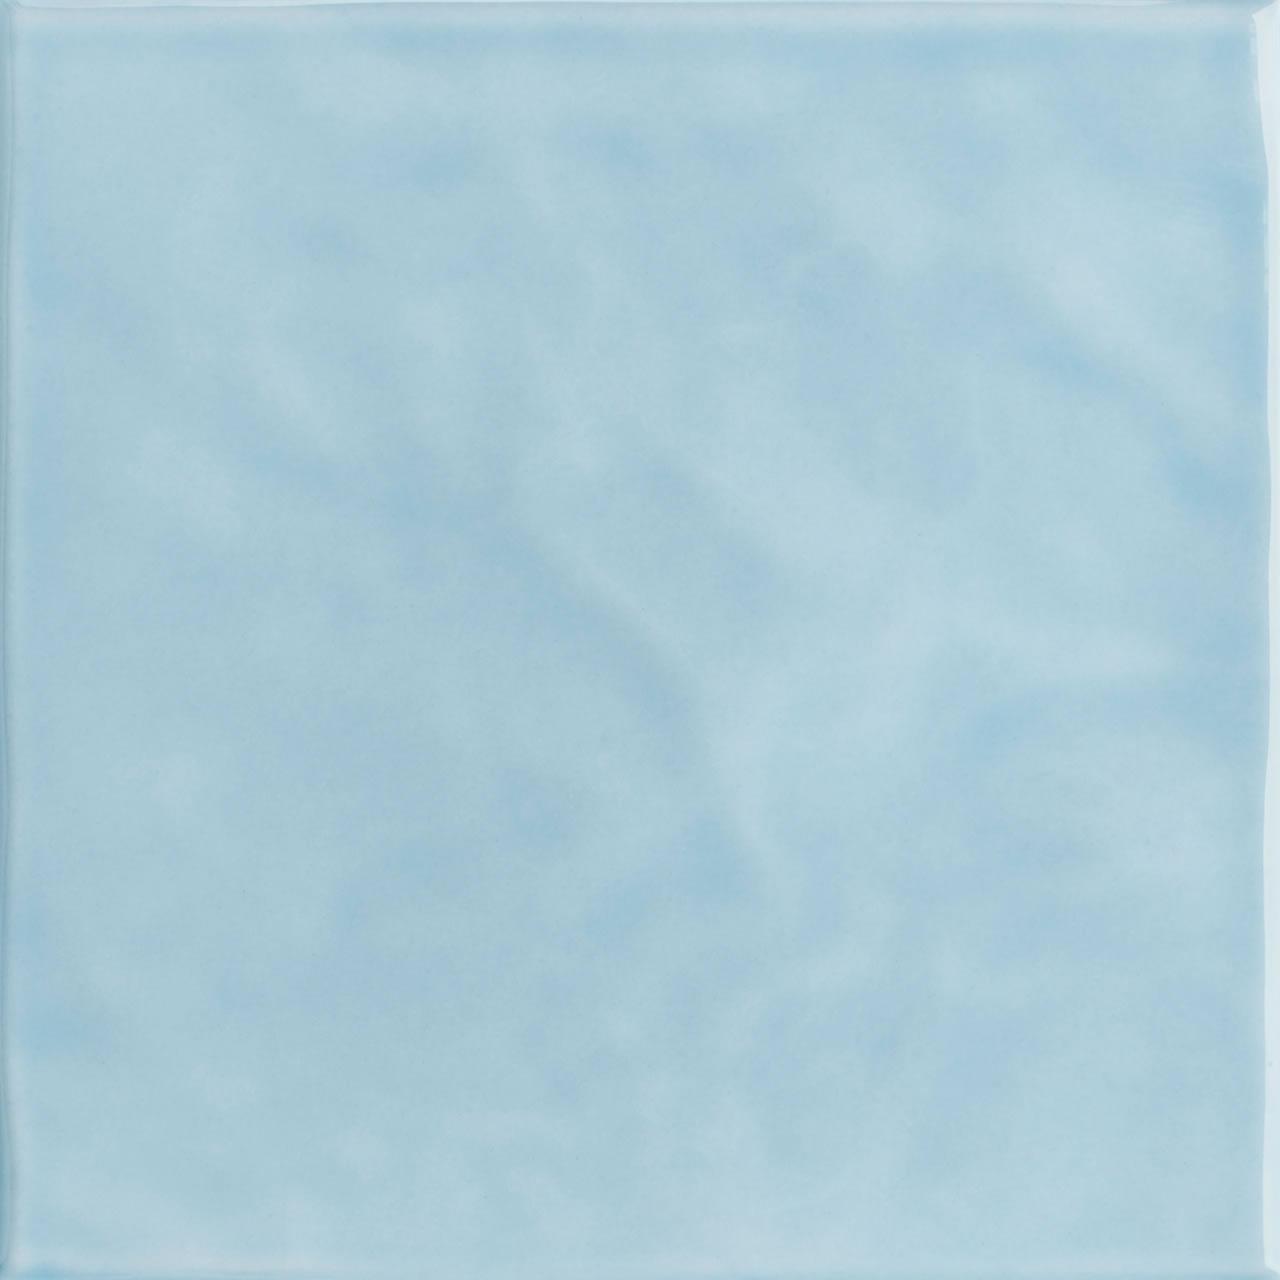 azul ceu onda br